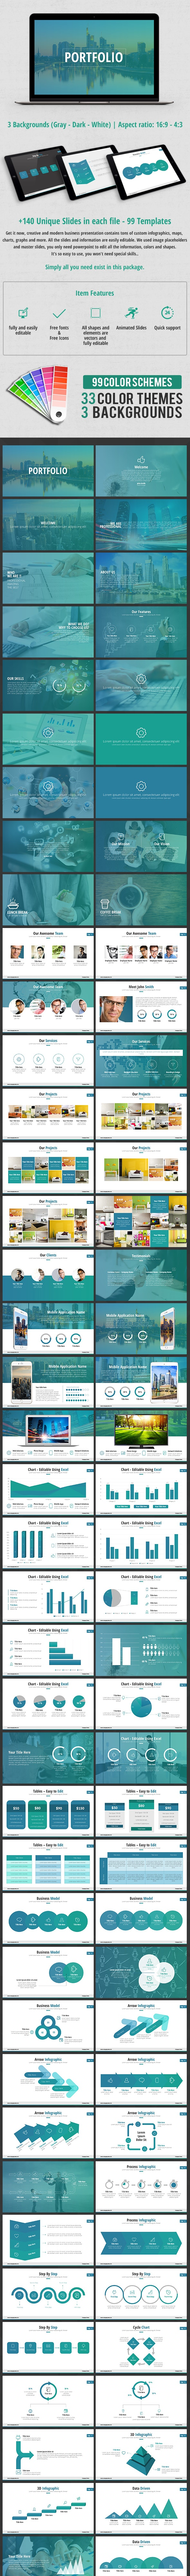 Business Portfolio PowerPoint Presentation - Business PowerPoint Templates